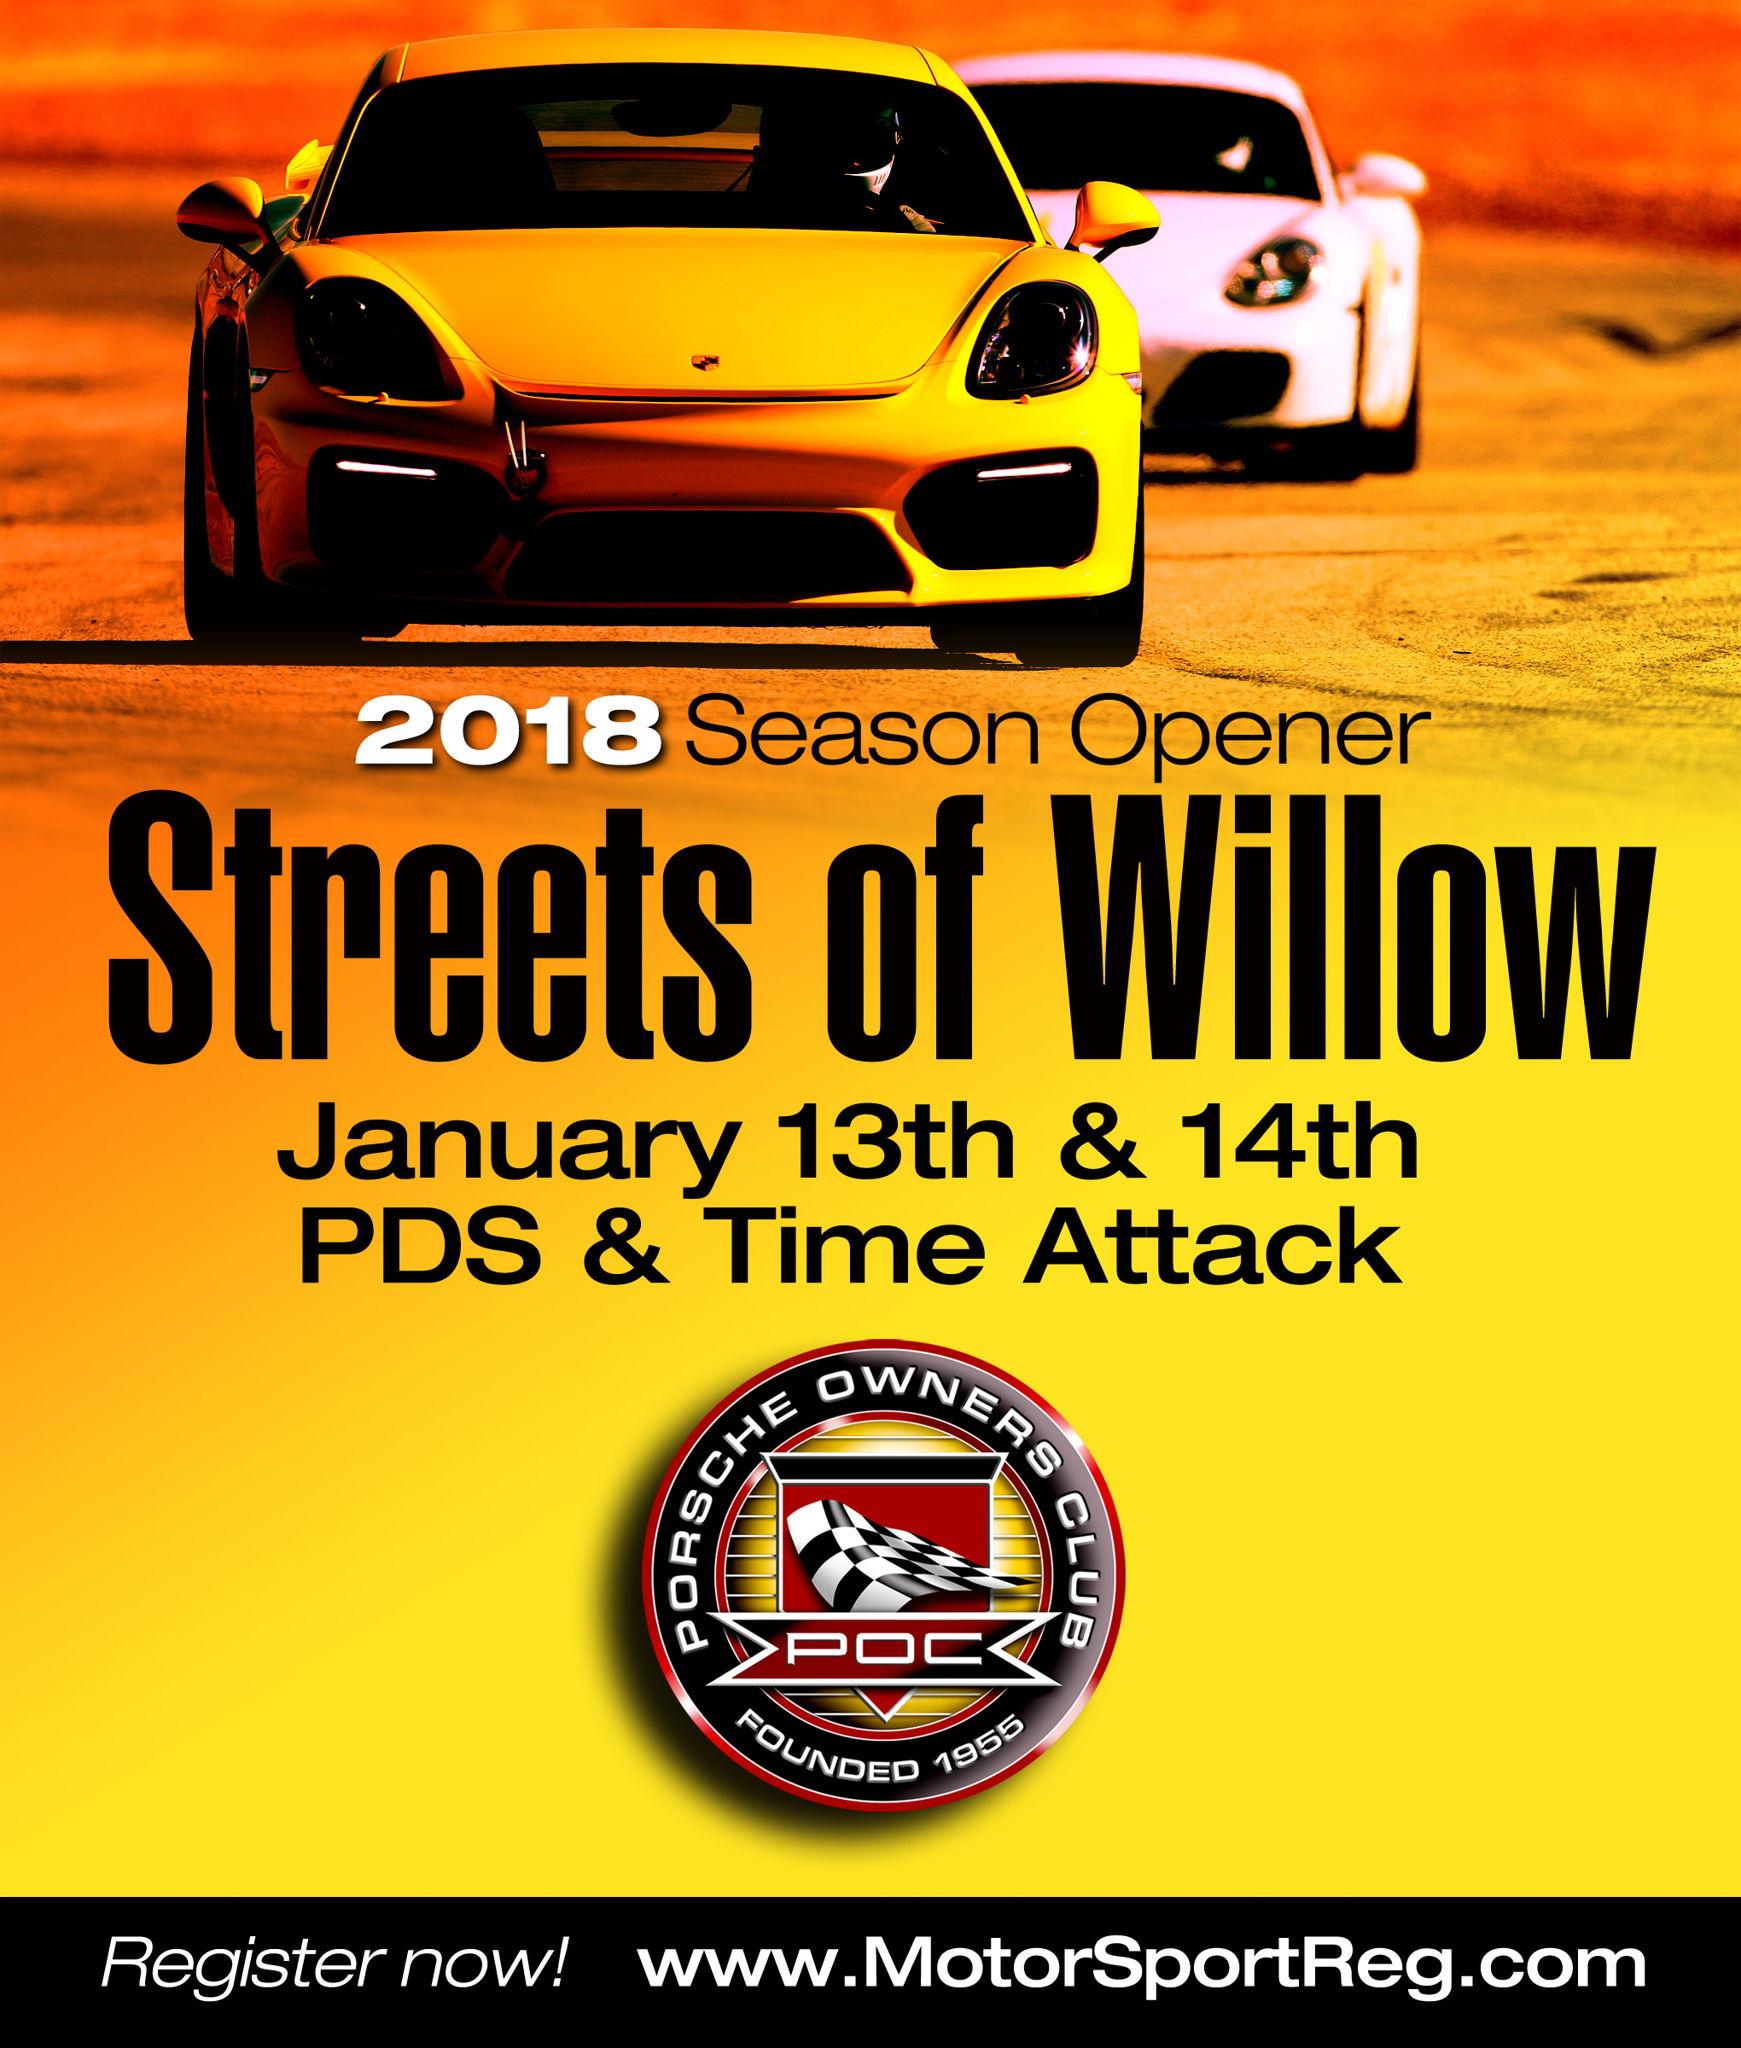 POC Streets of Willow Jan 13 14 2018 info on Jan 13 2018